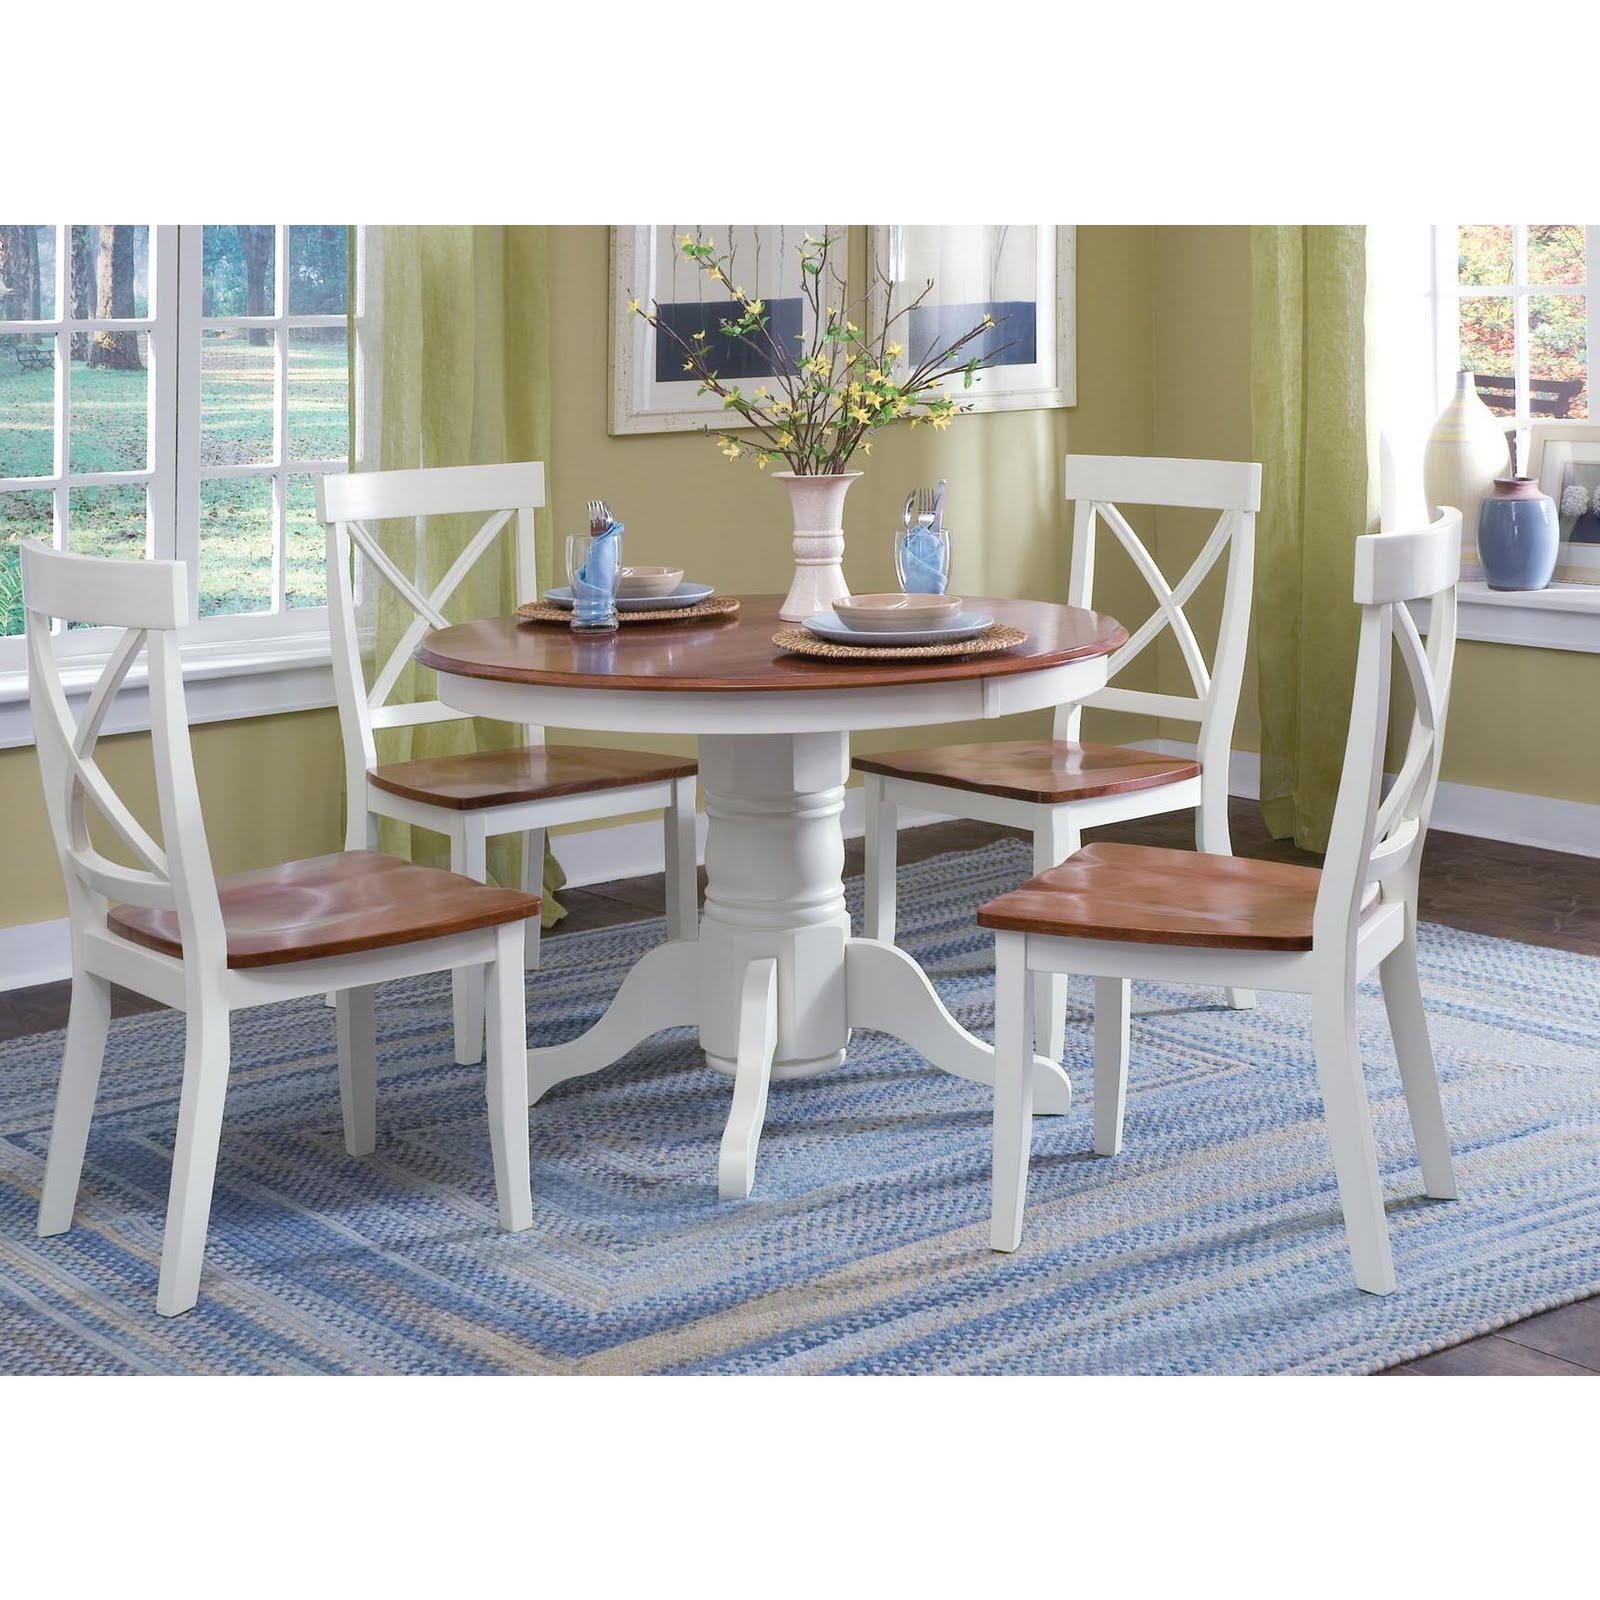 Craigslist Ventura Patio Furniture.Dining Room Table Craigslist Ventura